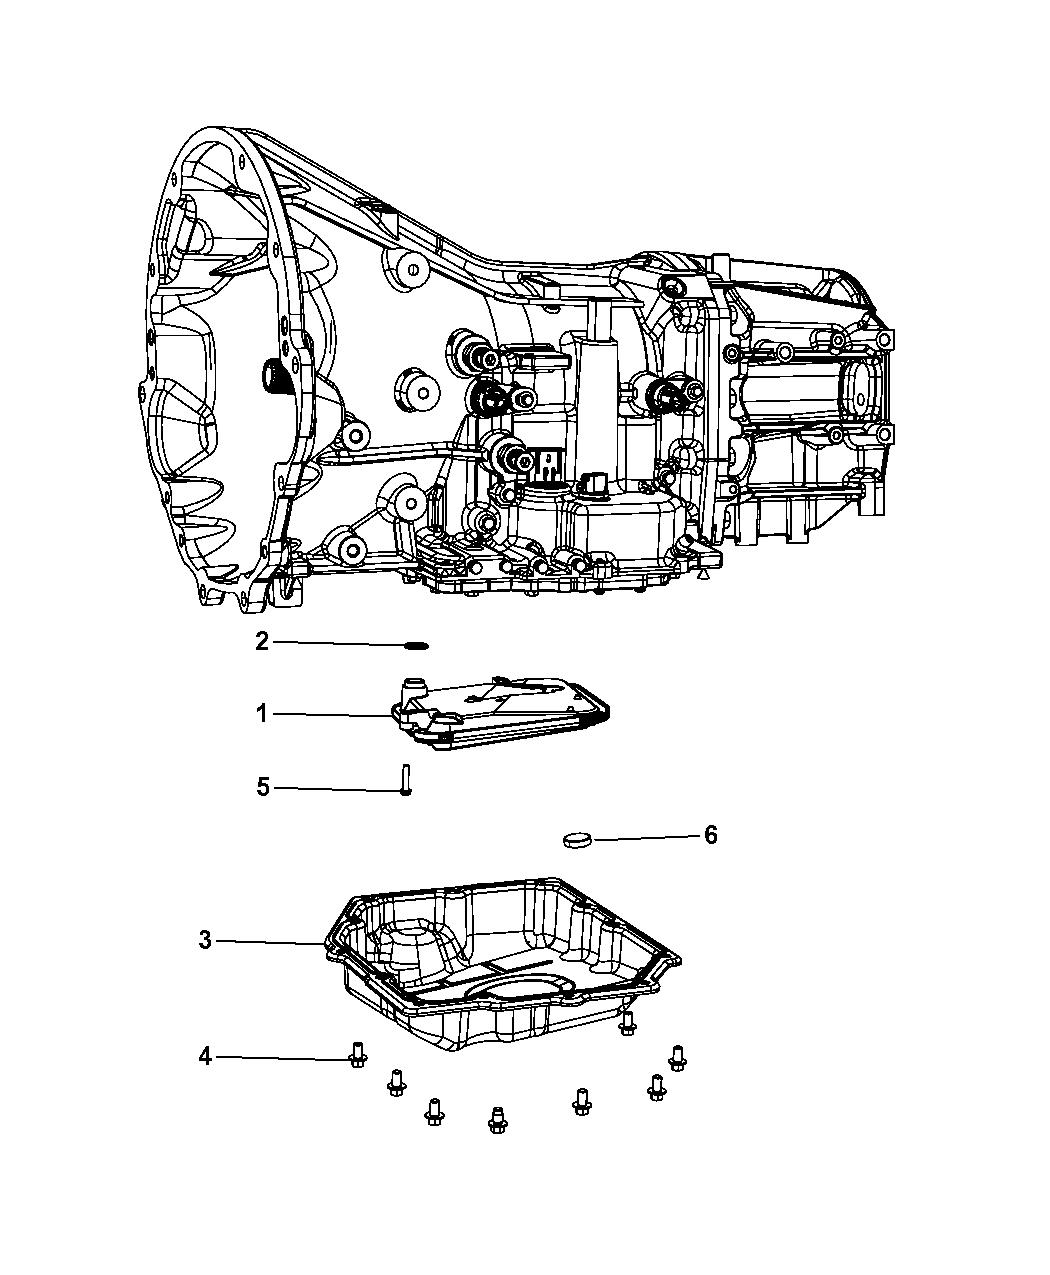 2011 Jeep Wrangler Oil Filter